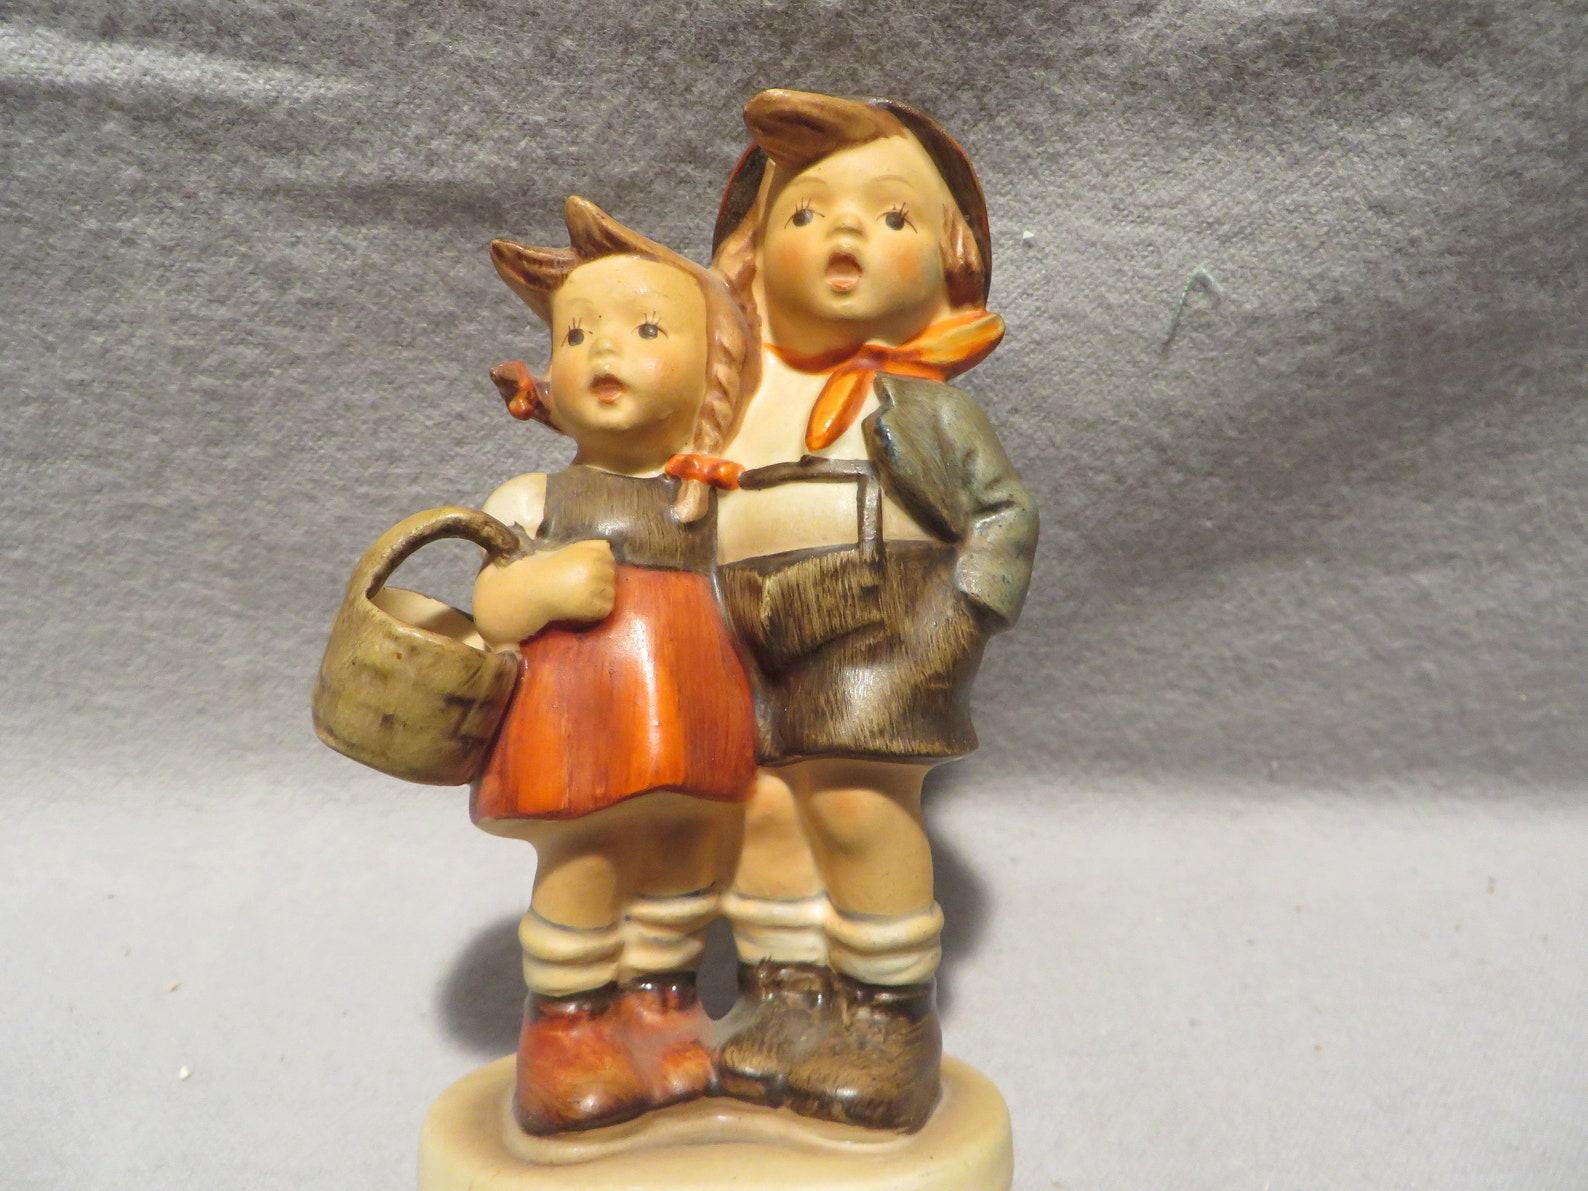 Vintage Hummel Figurine Number 94